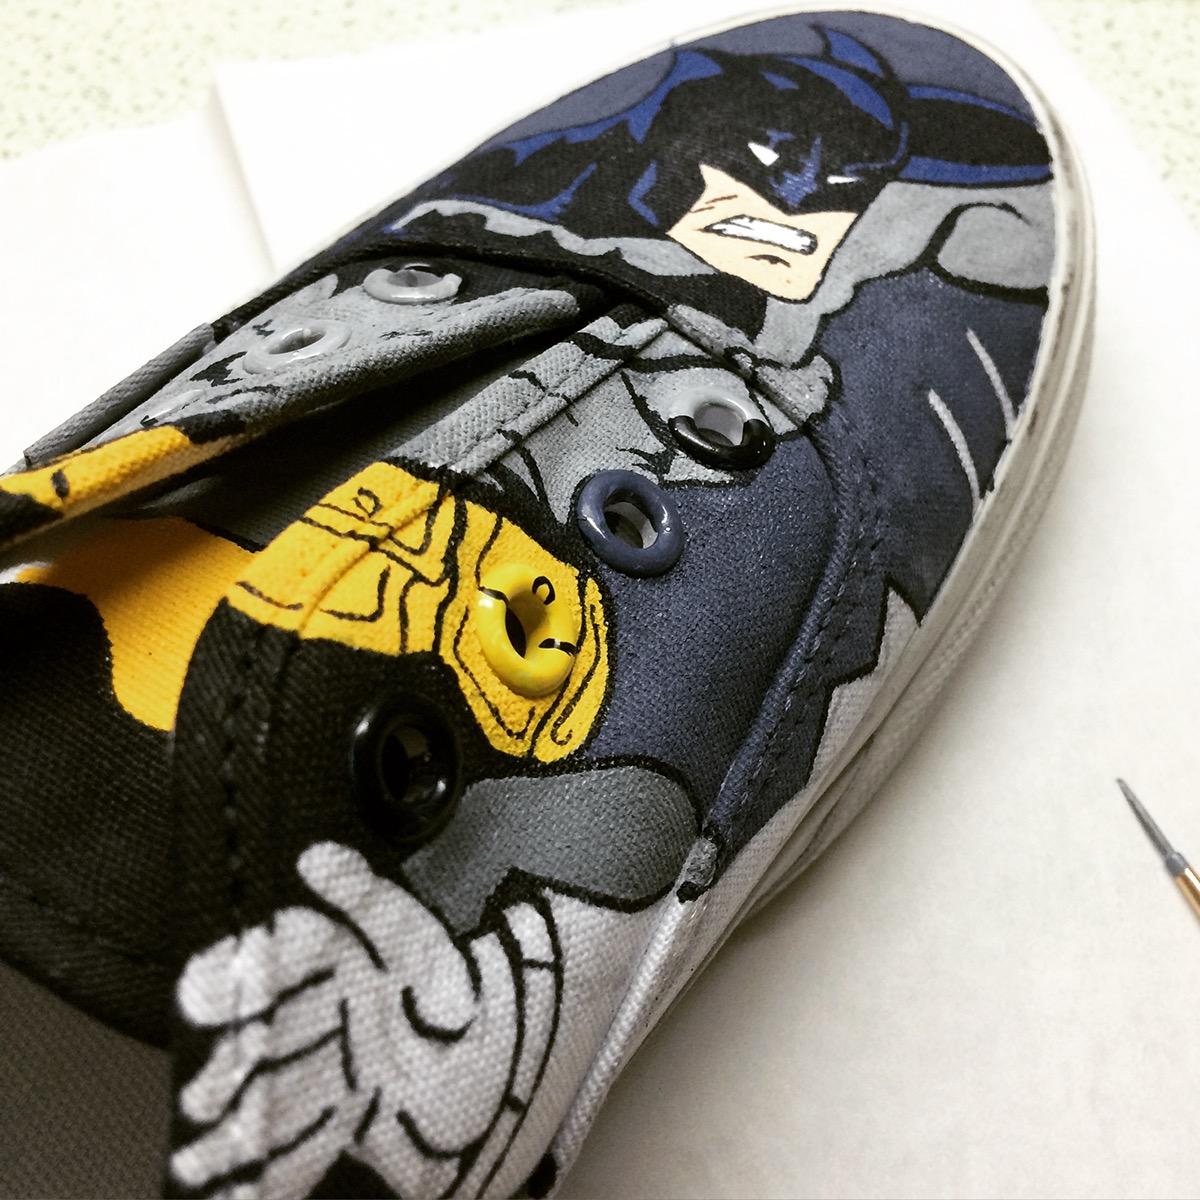 dbfe7bd43d28 The Batman vs The Joker hand painted on Vans white canvas shoes.